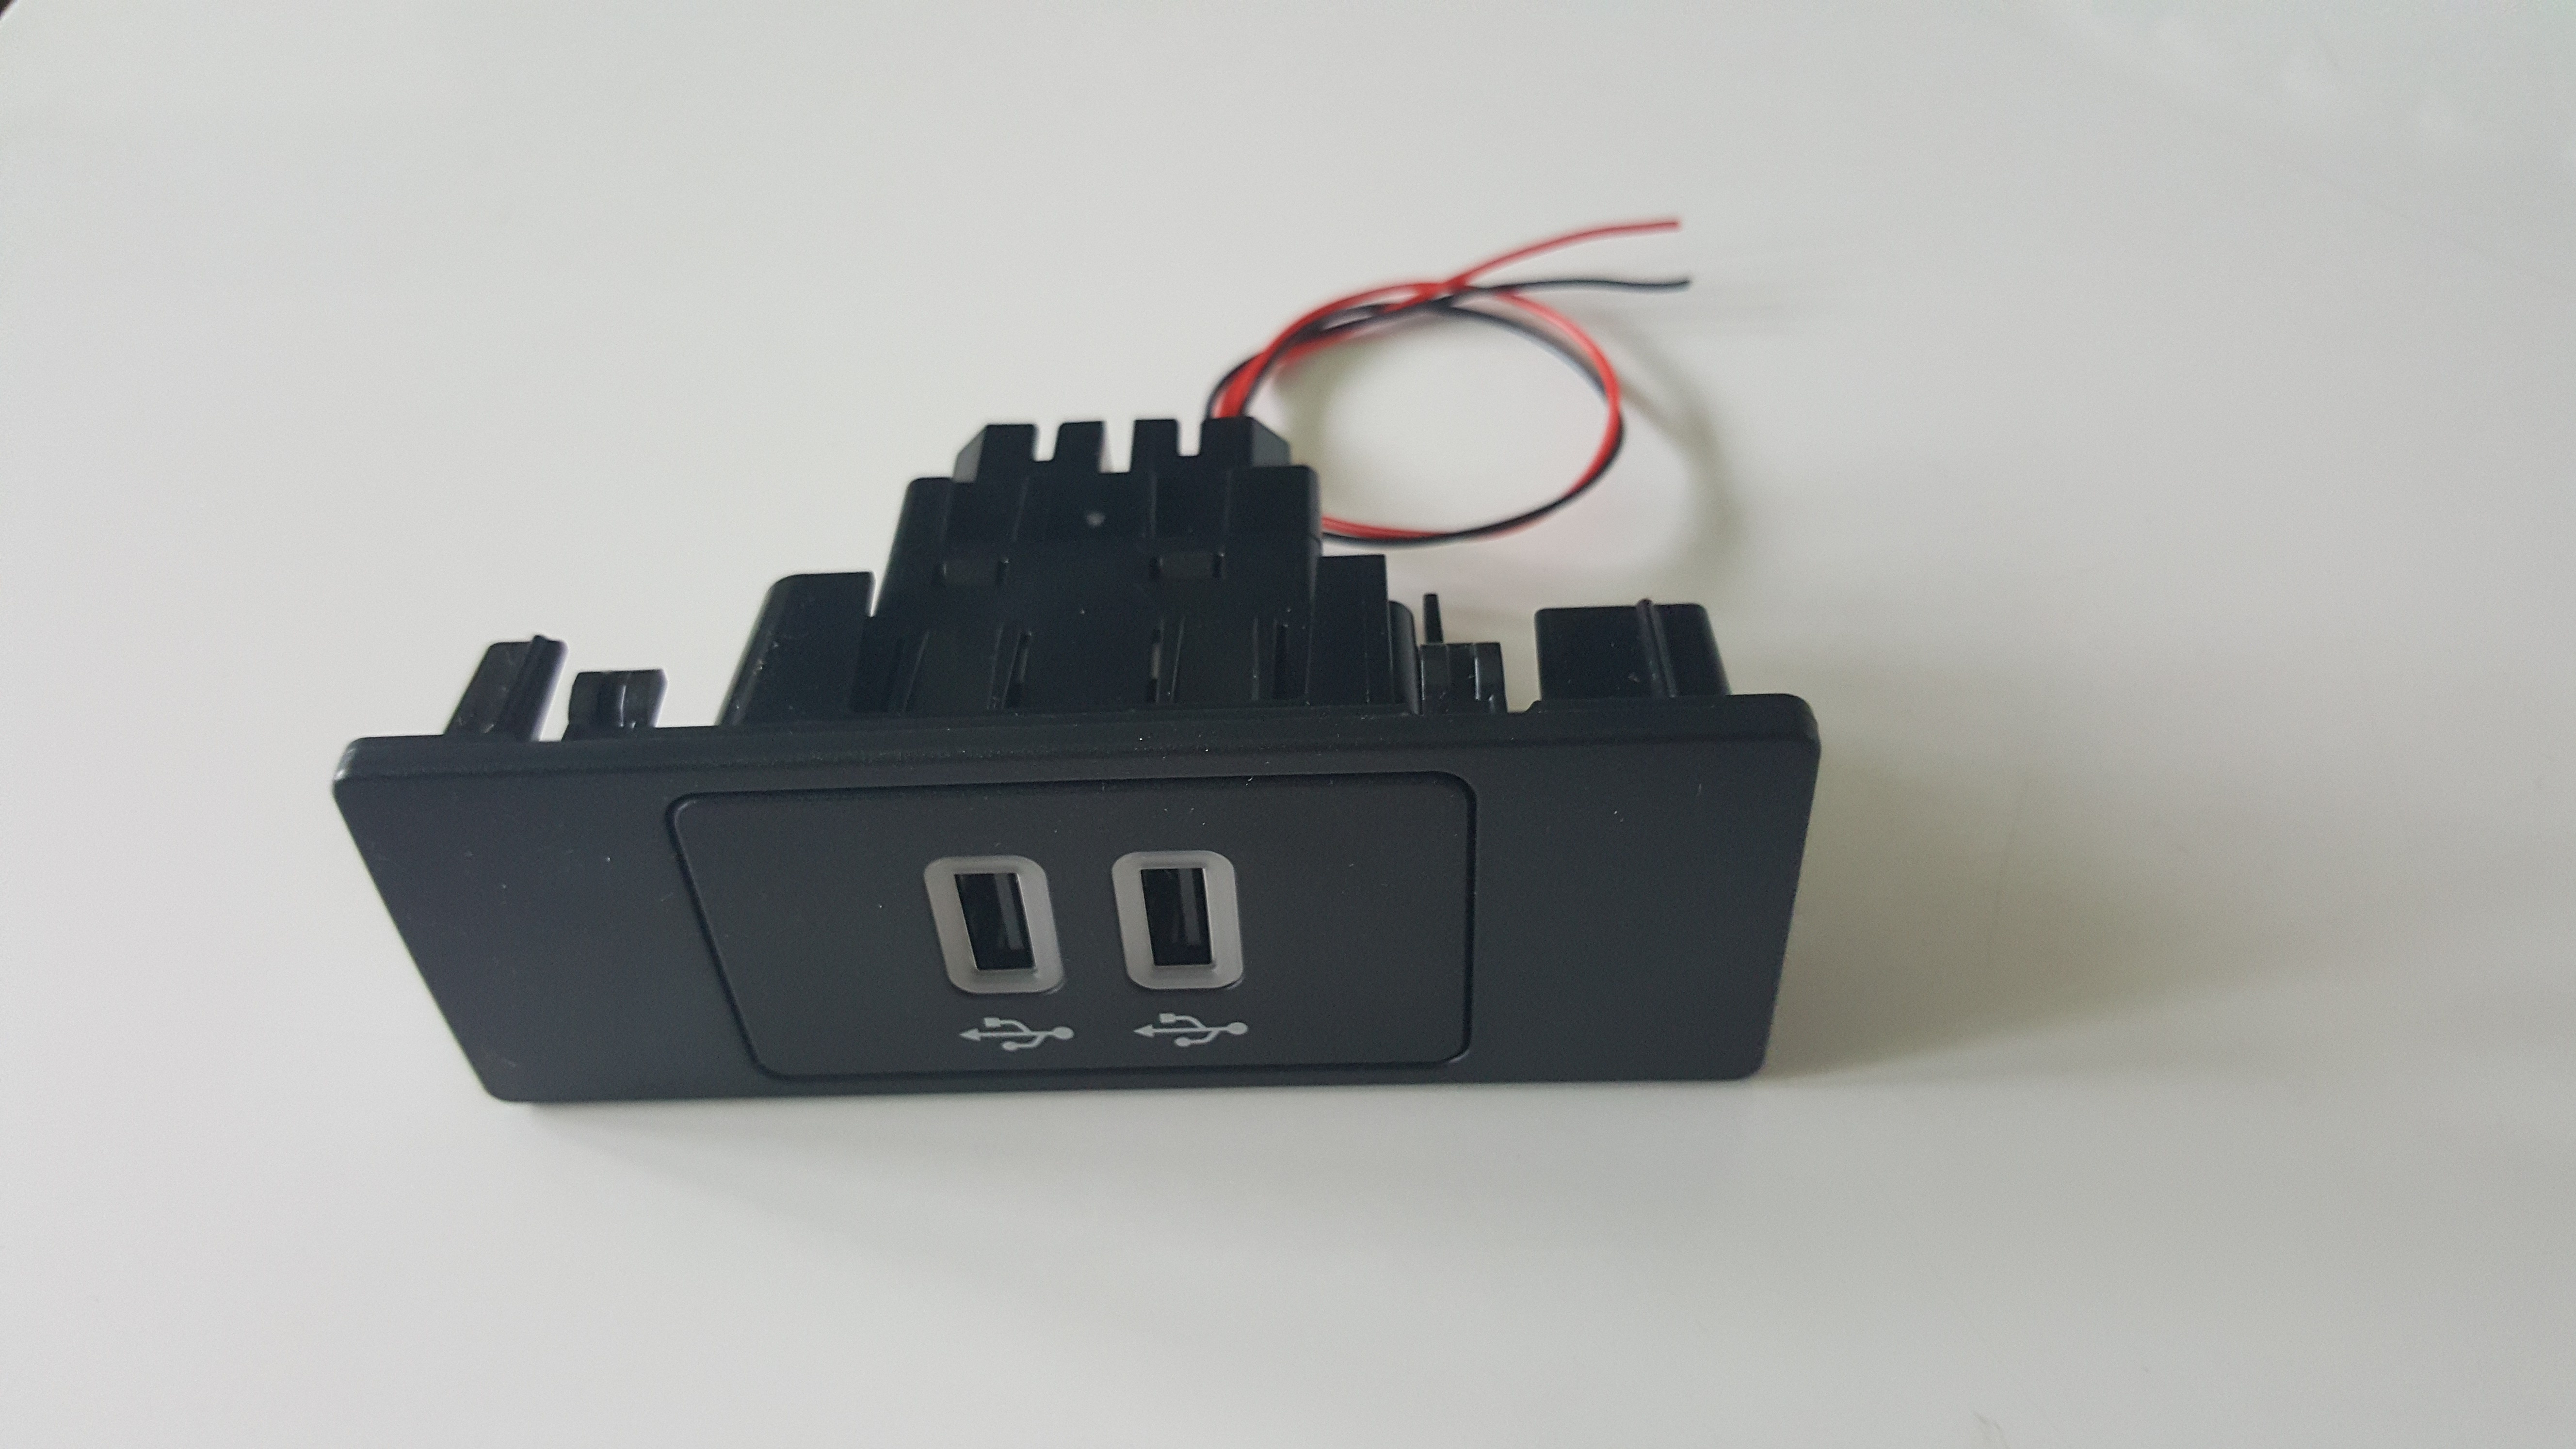 Ford Repair Shop >> SYNC 3 APPLE CARPLAY USB HUB | Sweden Car Performance